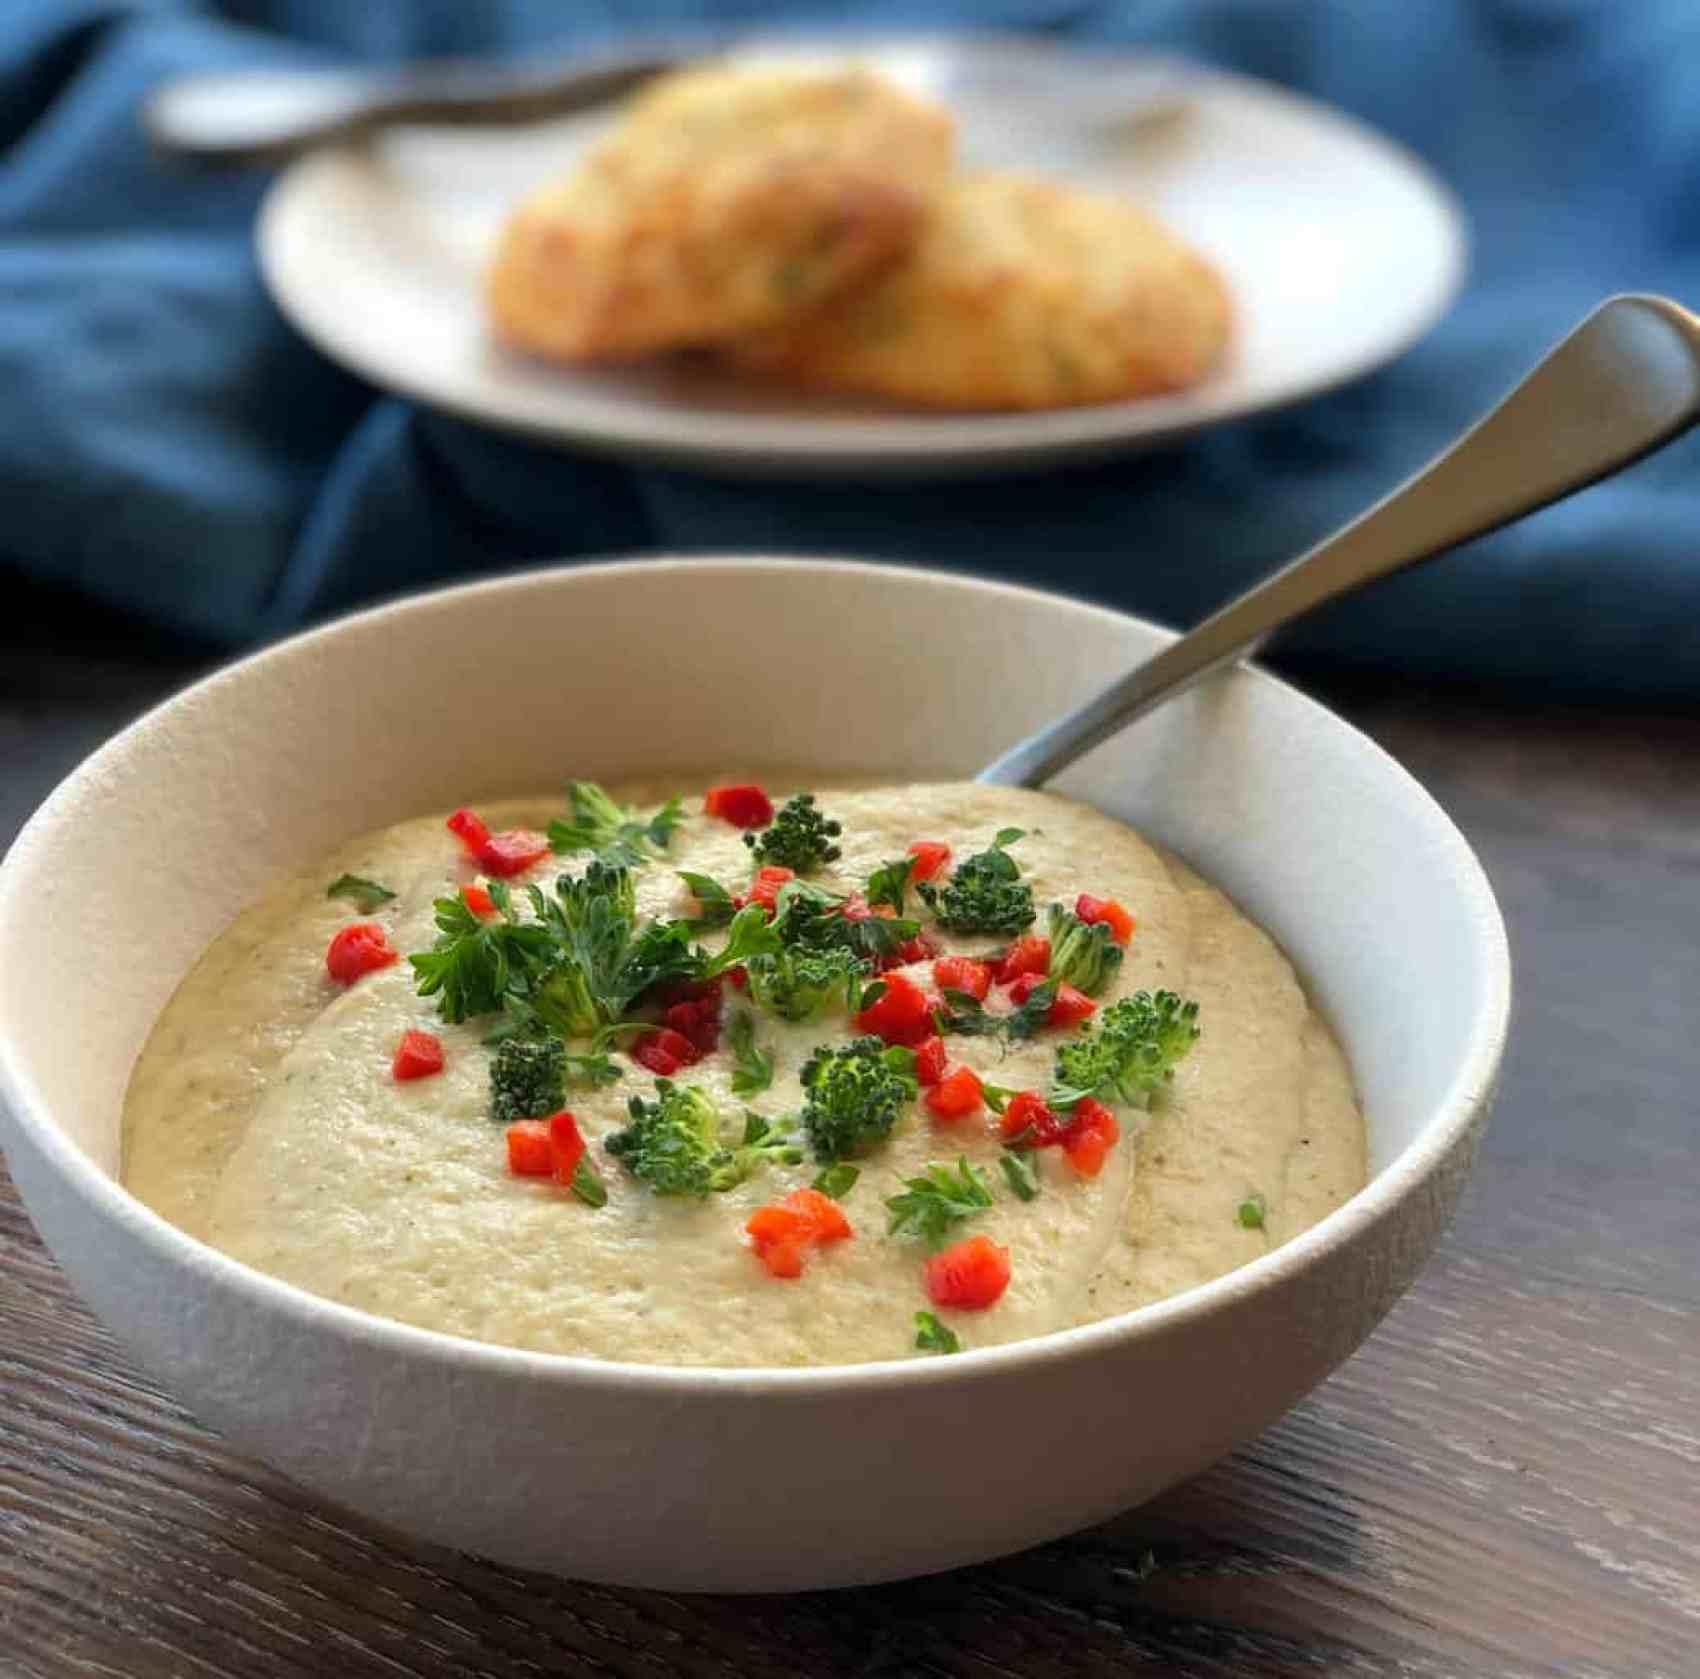 Cauliflower & Broccoli Soup